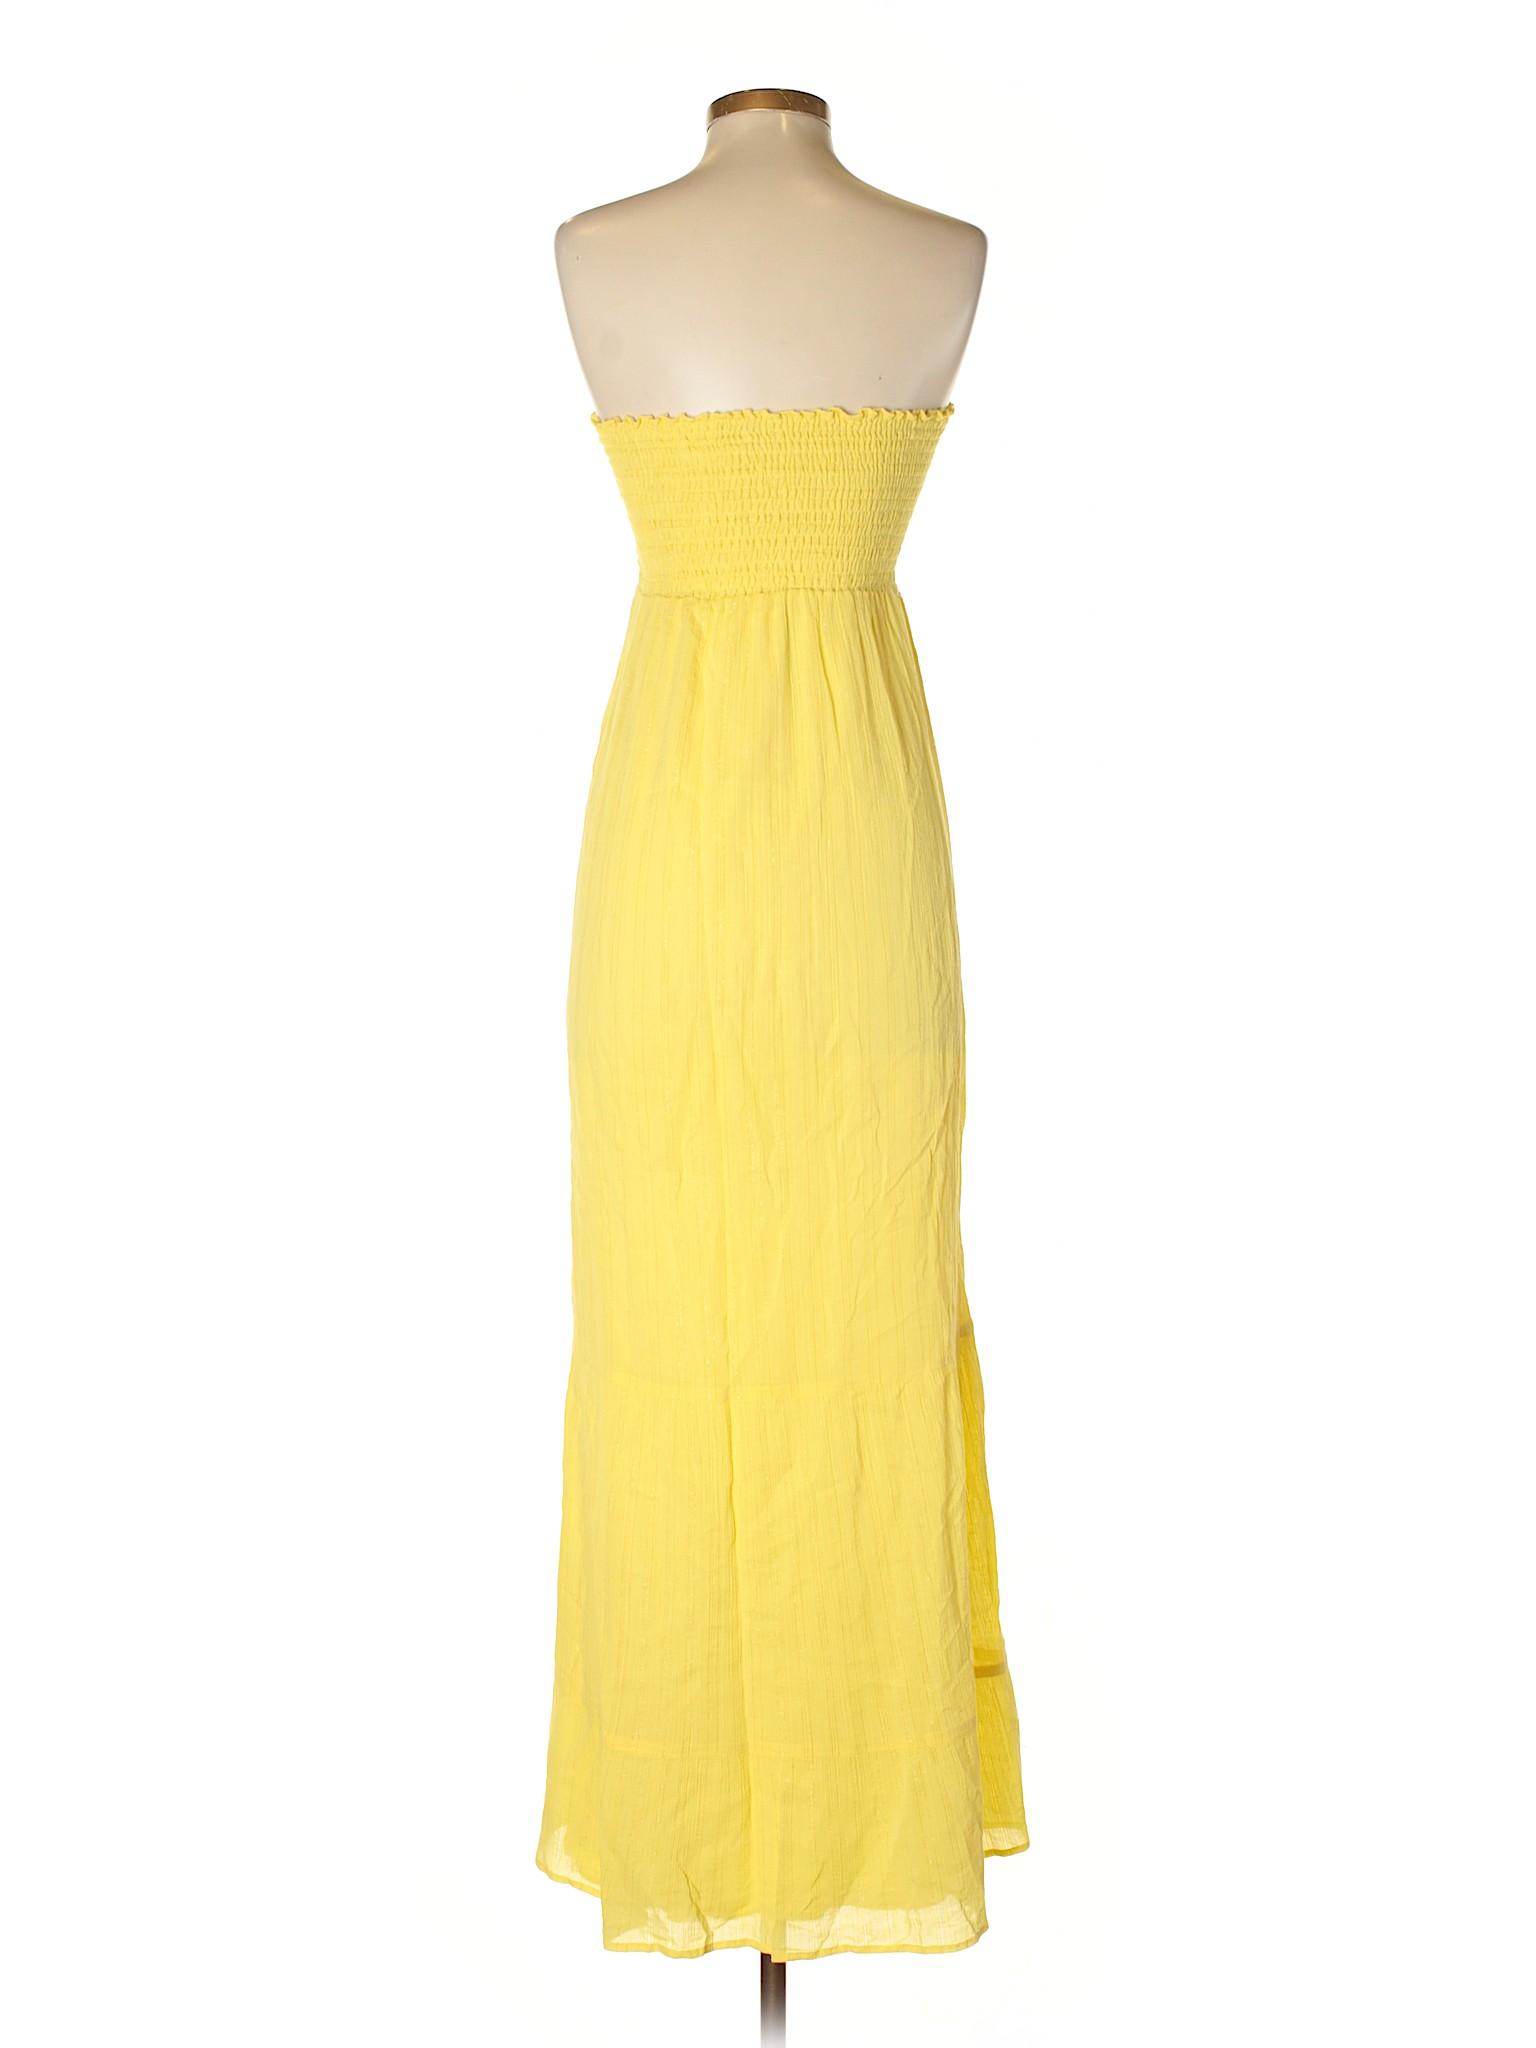 Moss Casual Selling Ella Casual Selling Dress Dress Ella Moss wRg1qY